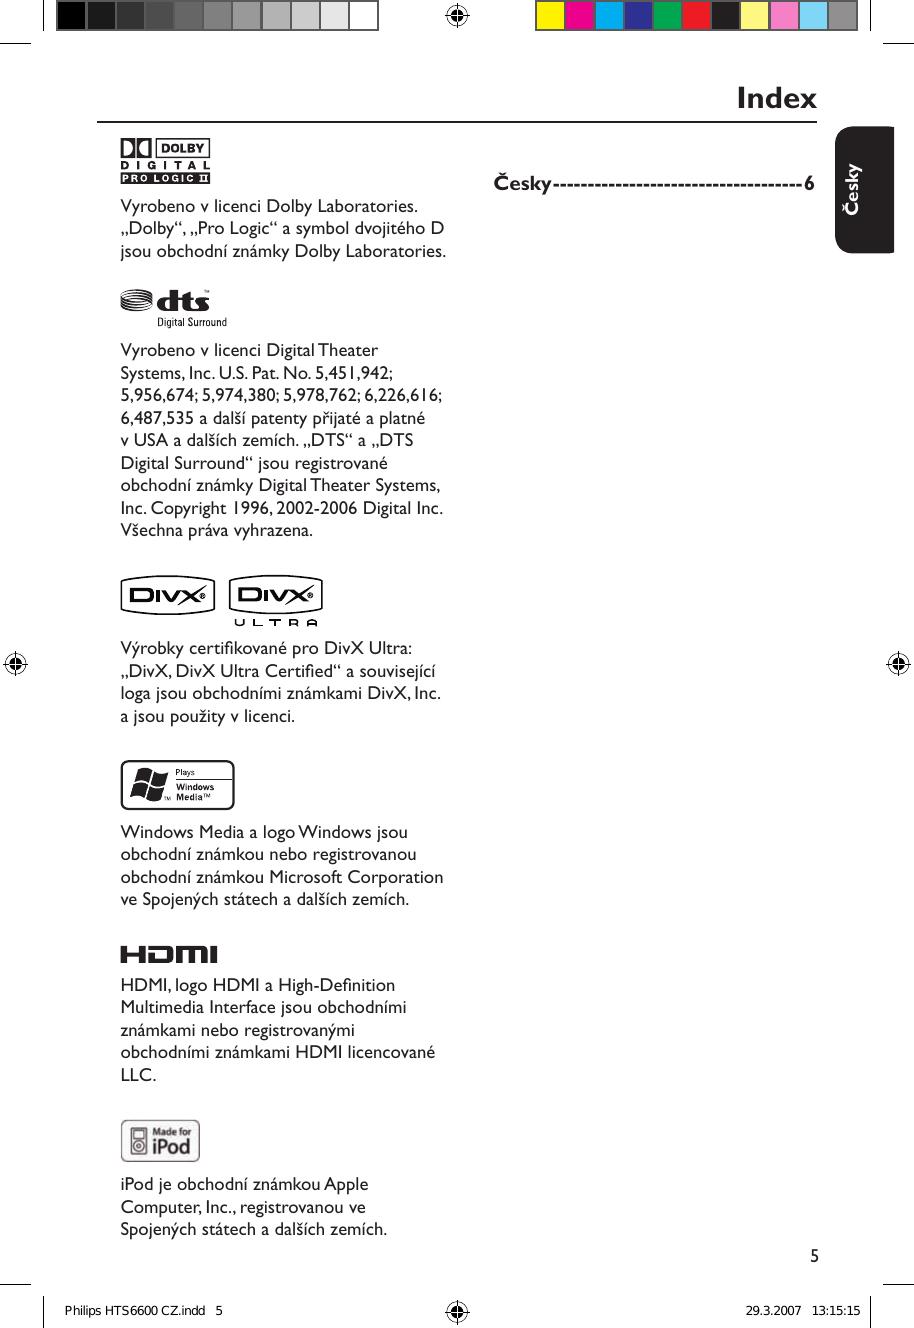 Philips HTS6600/12 User Manual Pou vate sk Prru ka Hts6600 12 ...